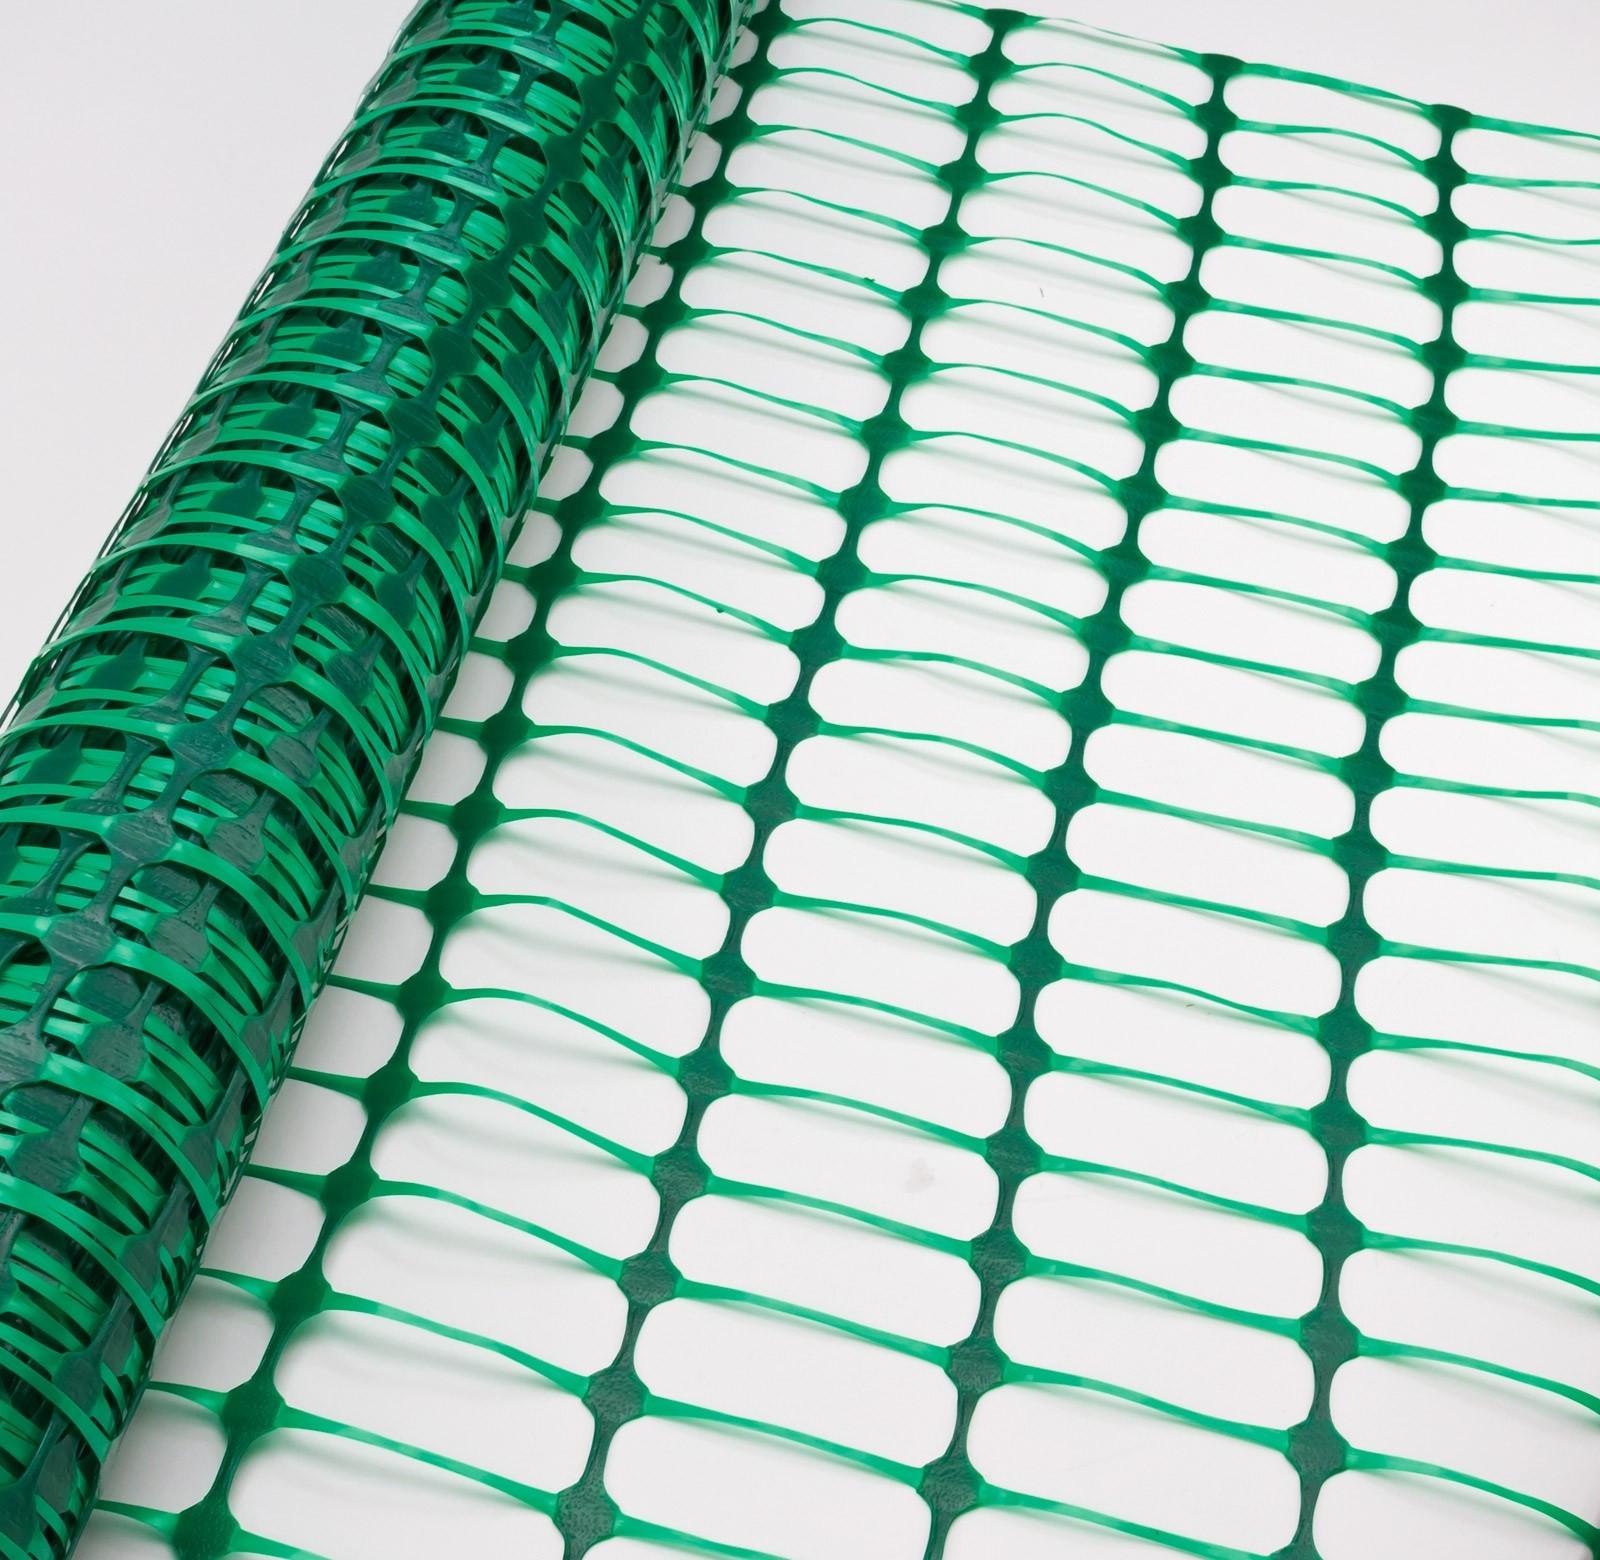 Dema Schutznetz / Bauzaun / Absicherungszaun Grün 50qm 50x1 m 31249